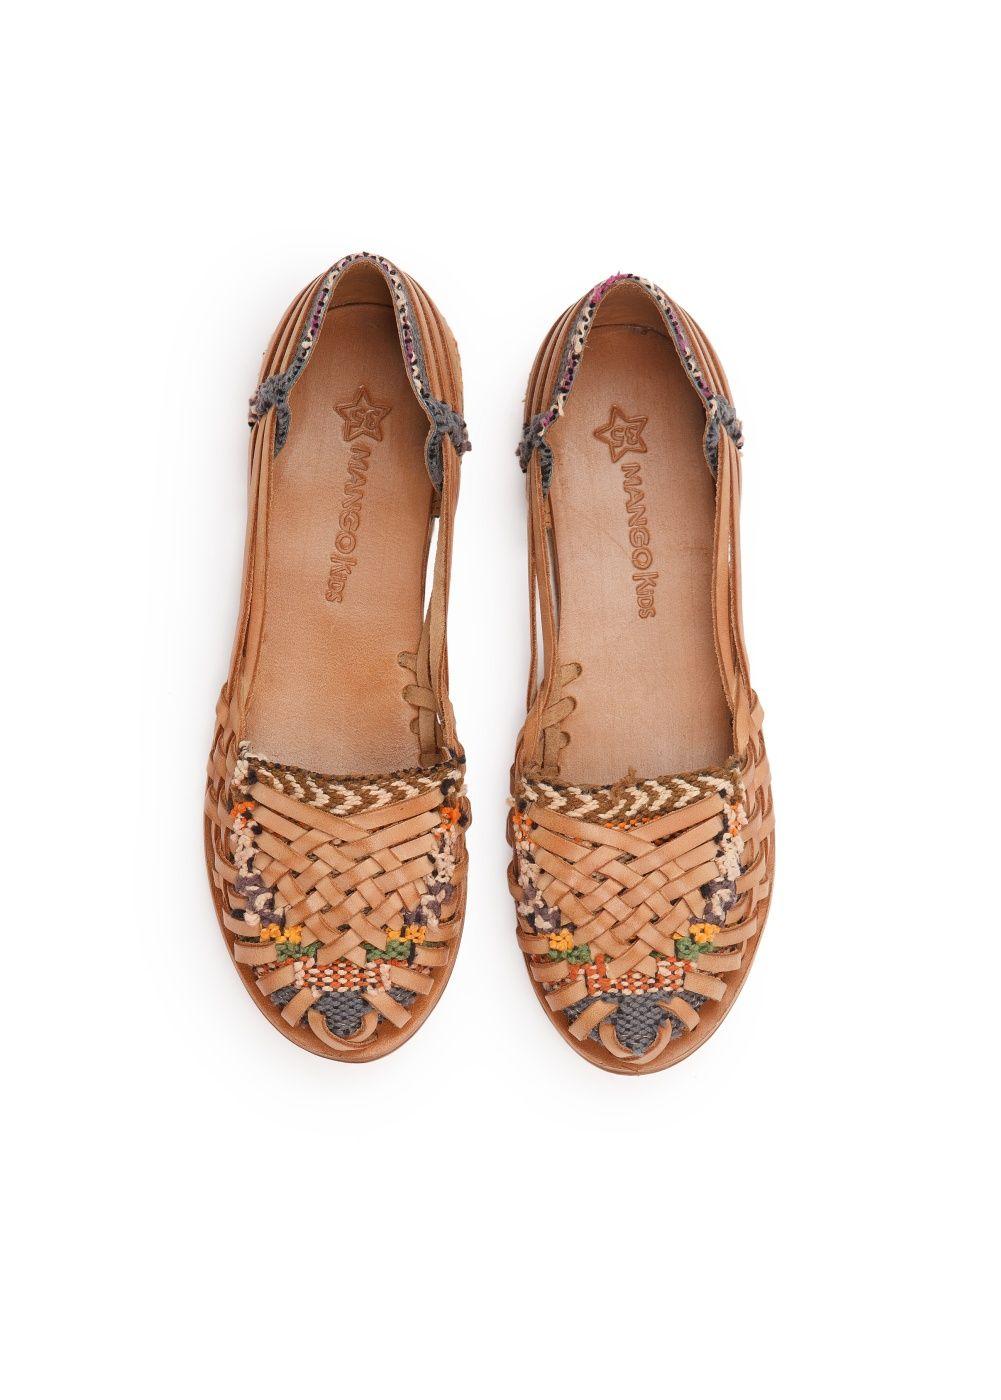 f01e3c9cc03d Sandali bassi intrecciati pelle Leather Sandals Flat